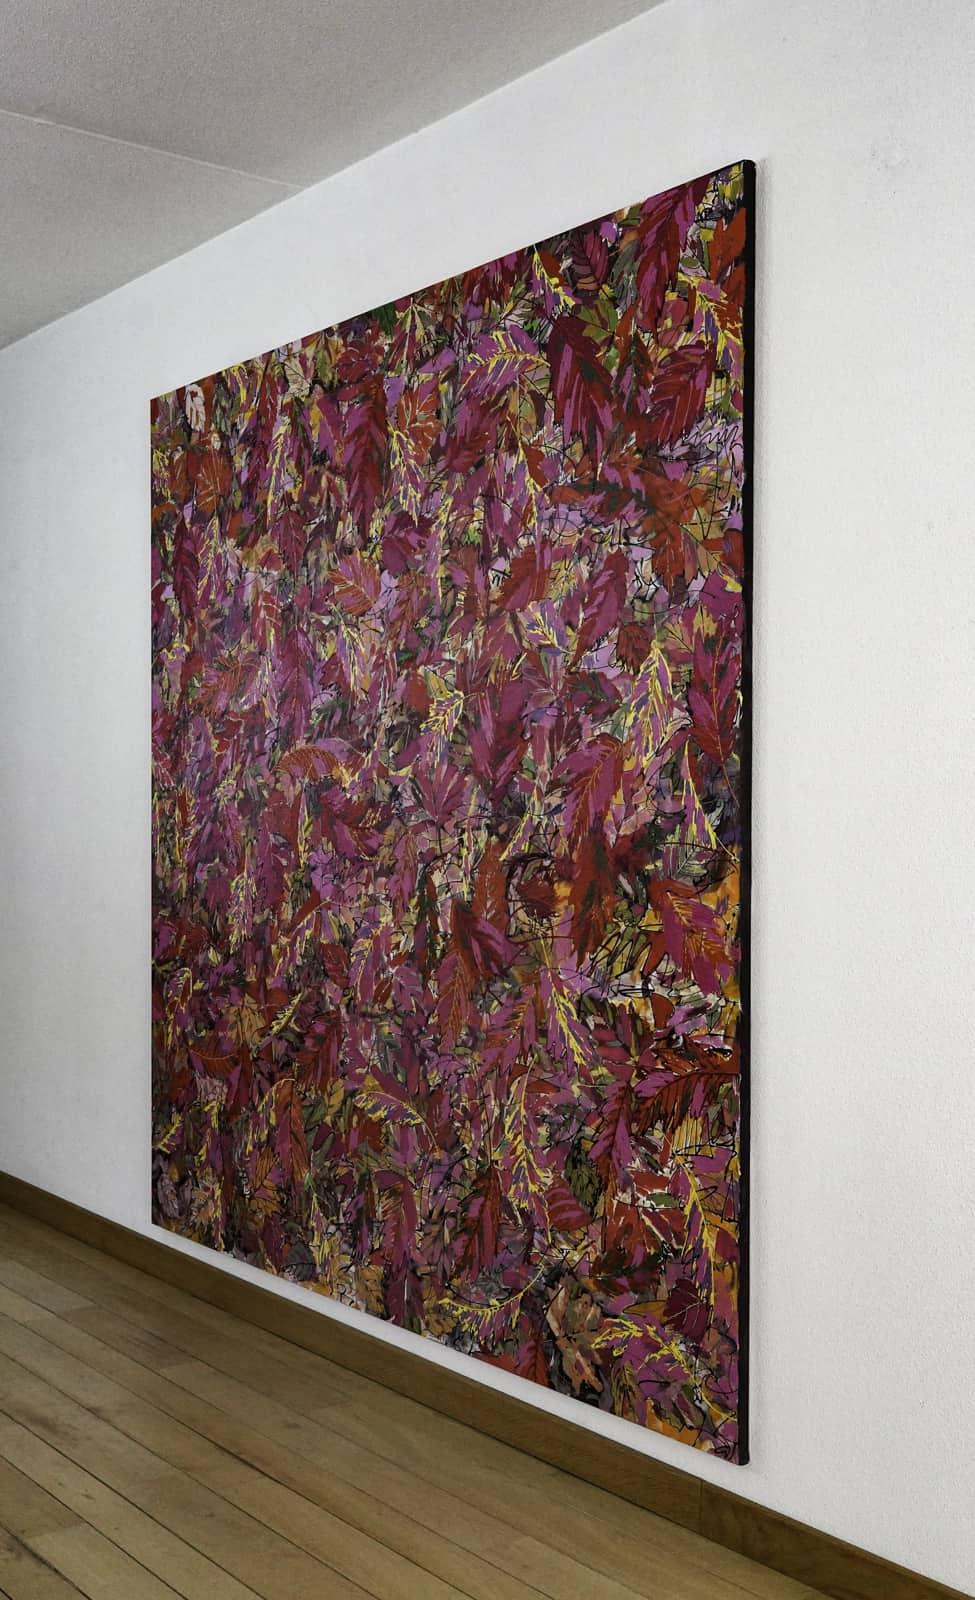 f7-4_Autumn-2019-5_200x200-acrylic-on-canvas_RIGHT